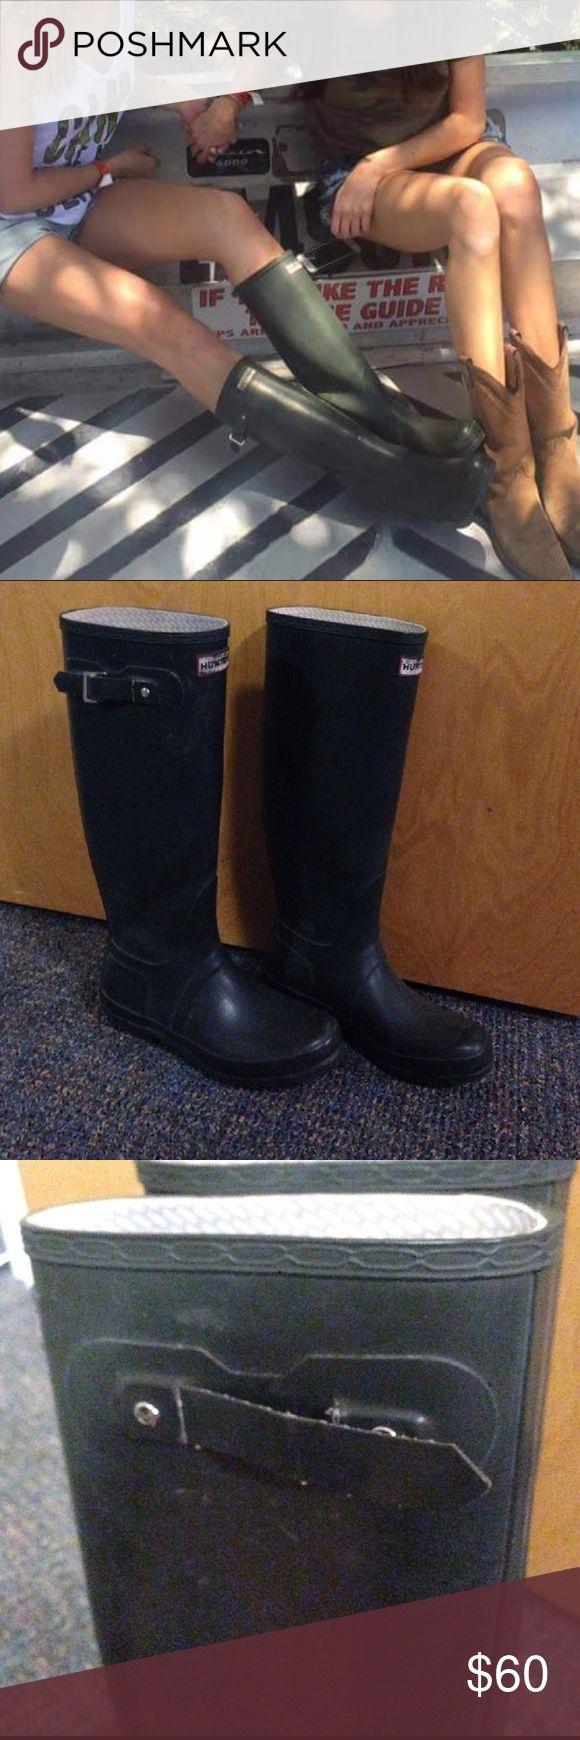 Matte green tall Hunter rain boots Under the knee tall Hunter rain boots in a medium - dark green. Worn but in good shape, see photographs. Hunter Shoes Winter & Rain Boots